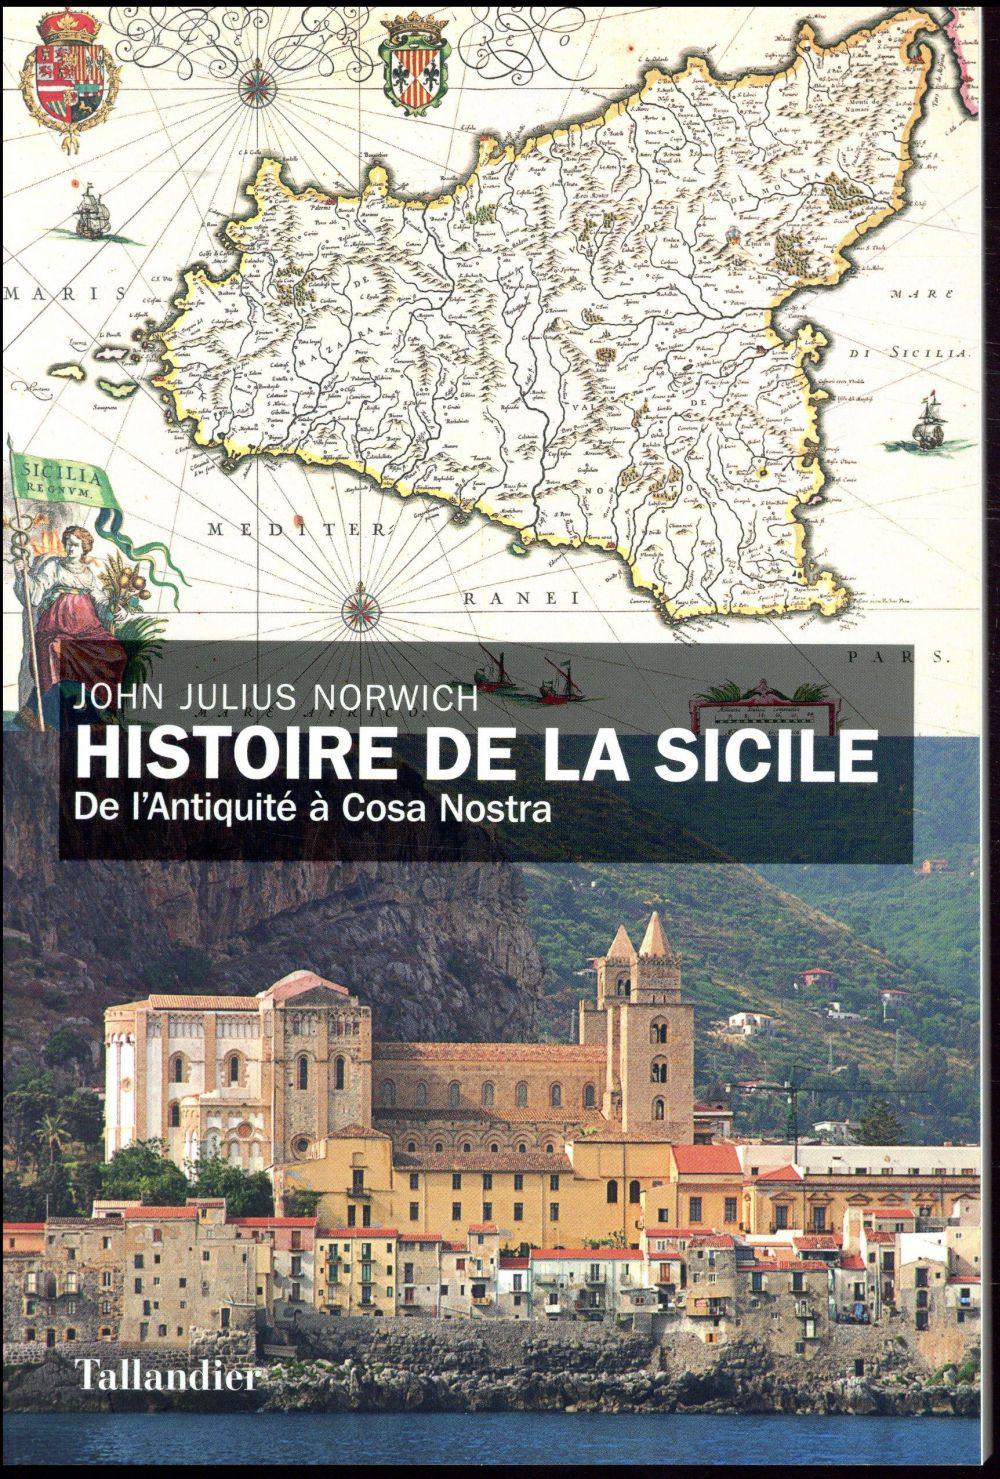 HISTOIRE DE LA SICILE - DE L'ANTIQUITE A COSA NOSTRA